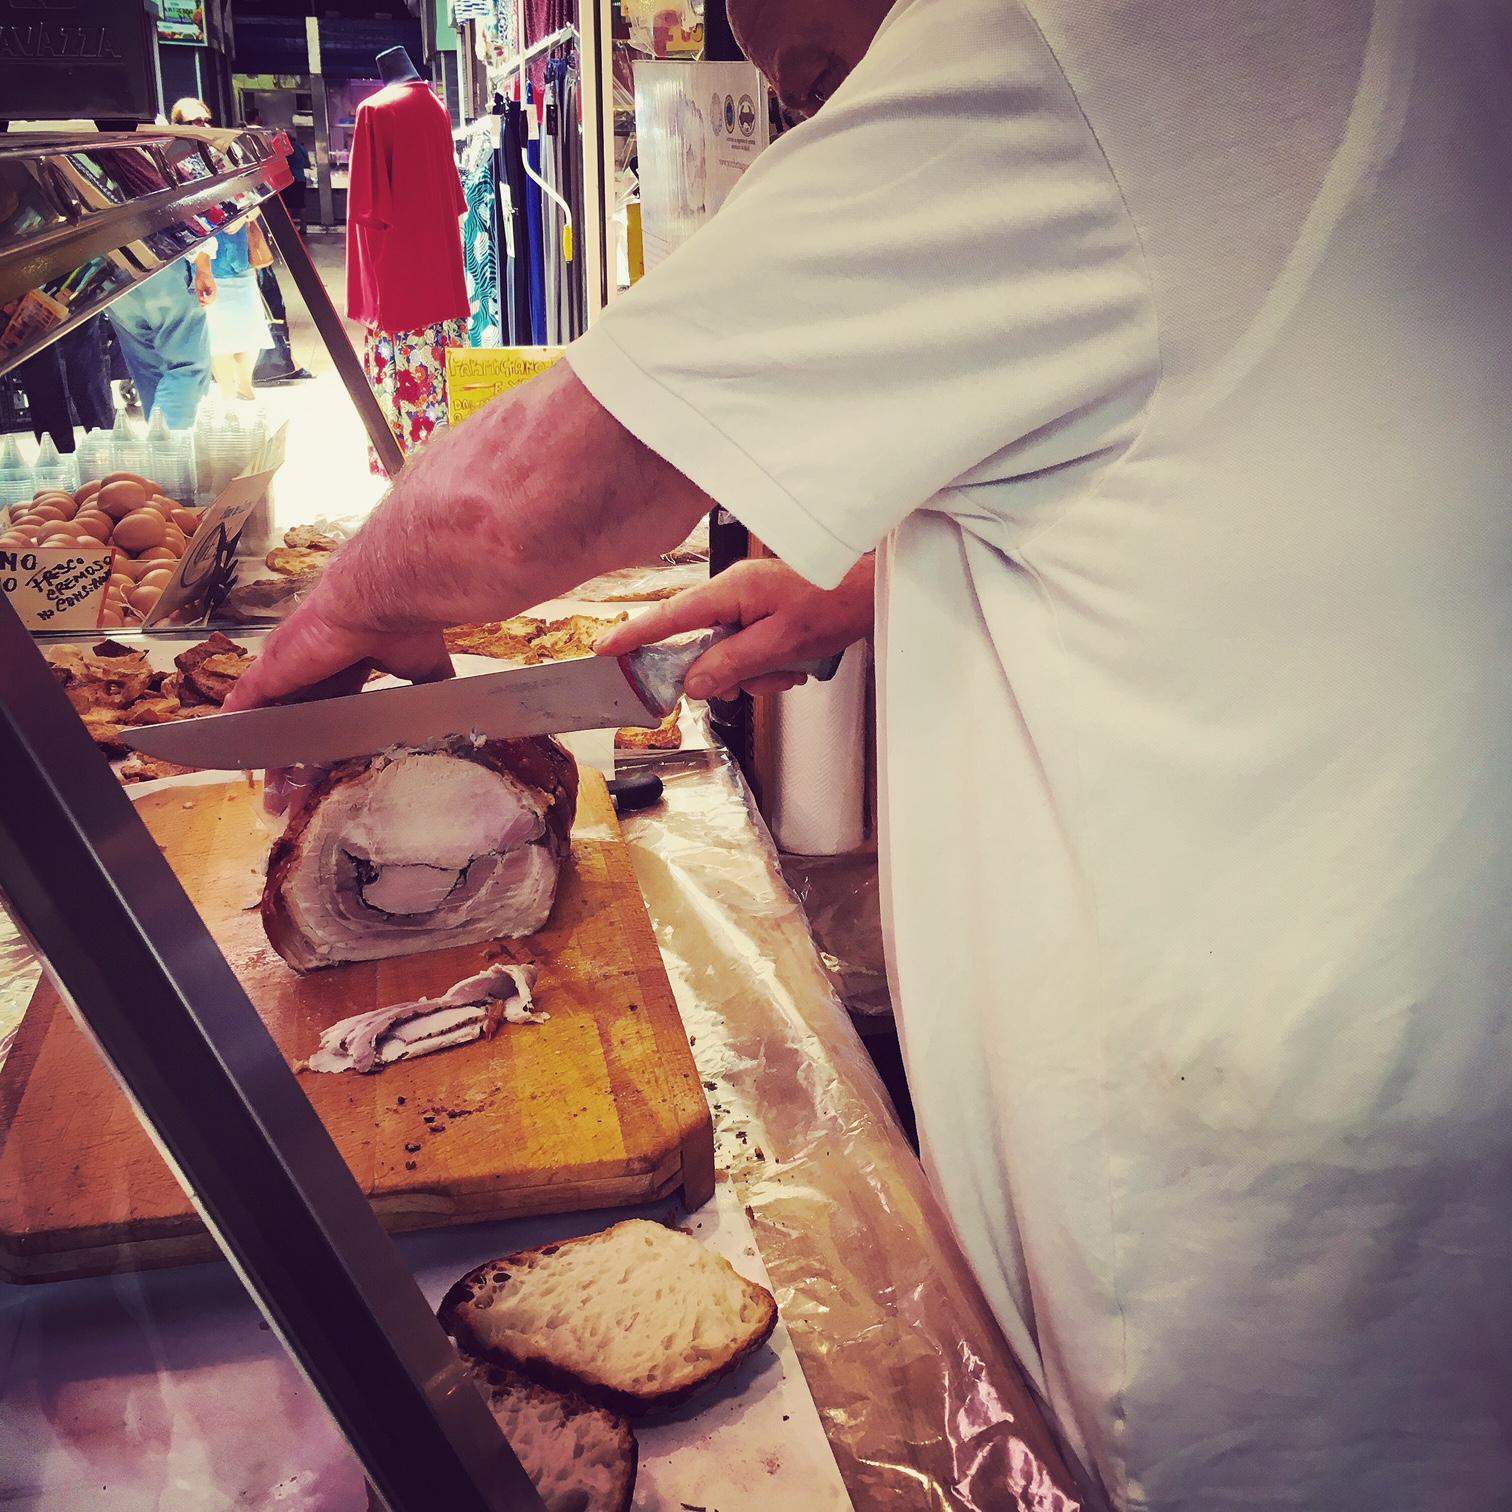 Knife-wielding man preparing a panino di porchetta